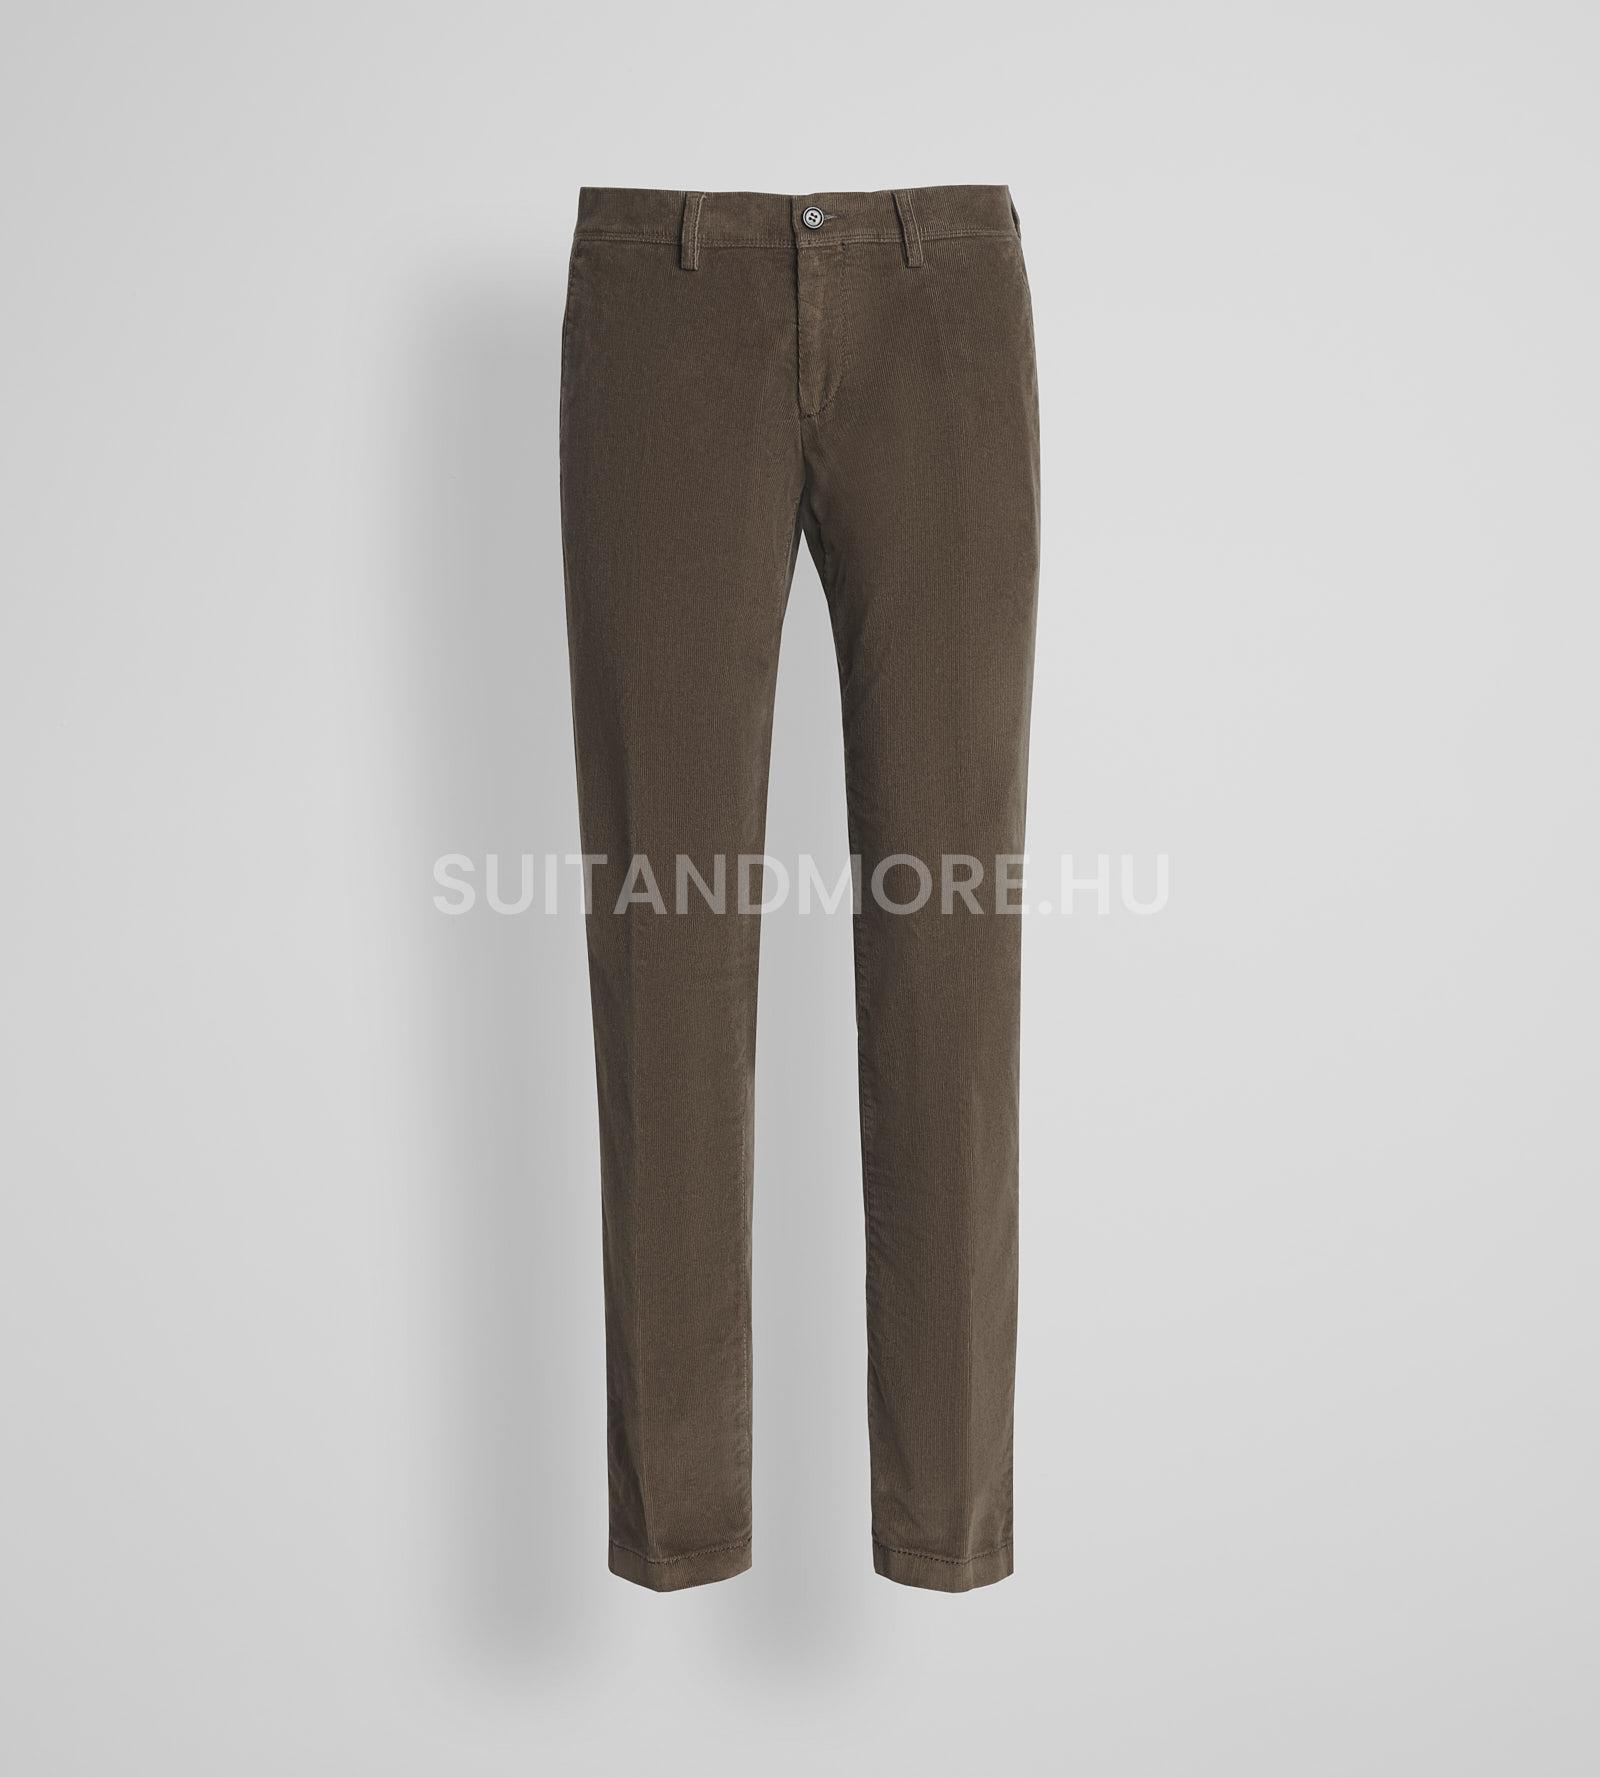 DIGEL-sötétbarna-extra-slim-fit-pamut-sztreccs-kord-nadrág-NIGEL-1281576-34-01